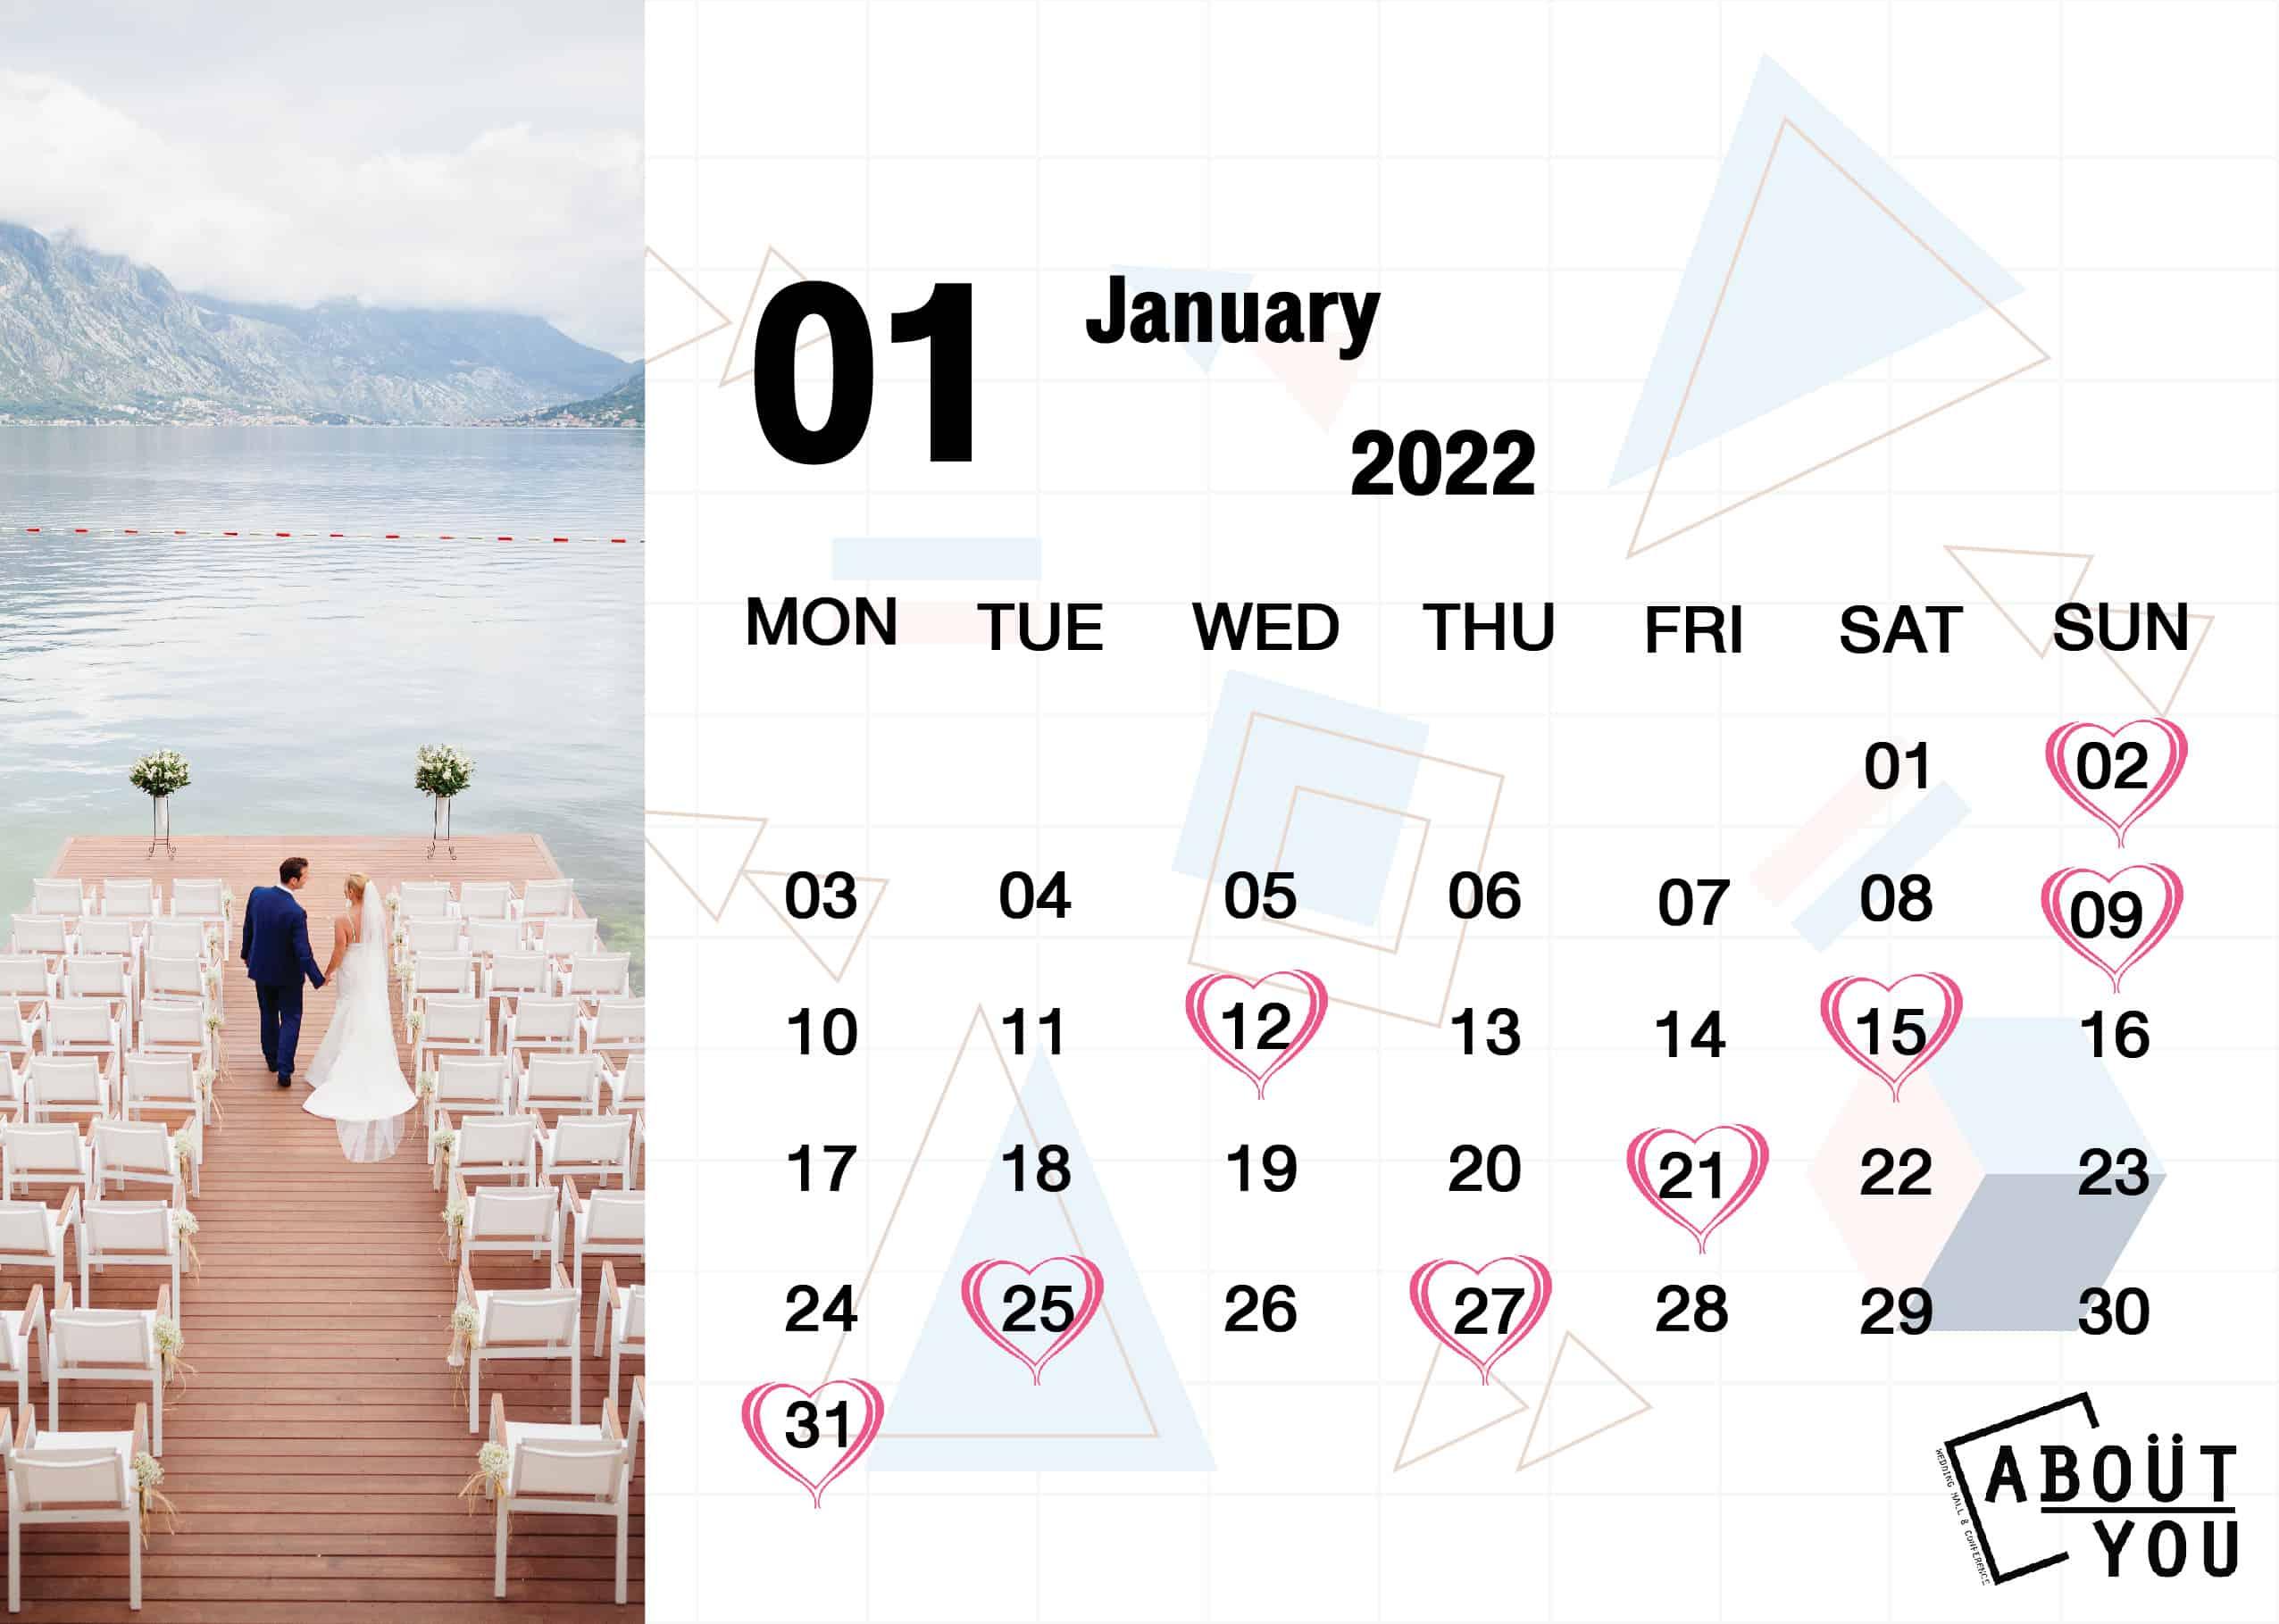 calendar About you-02